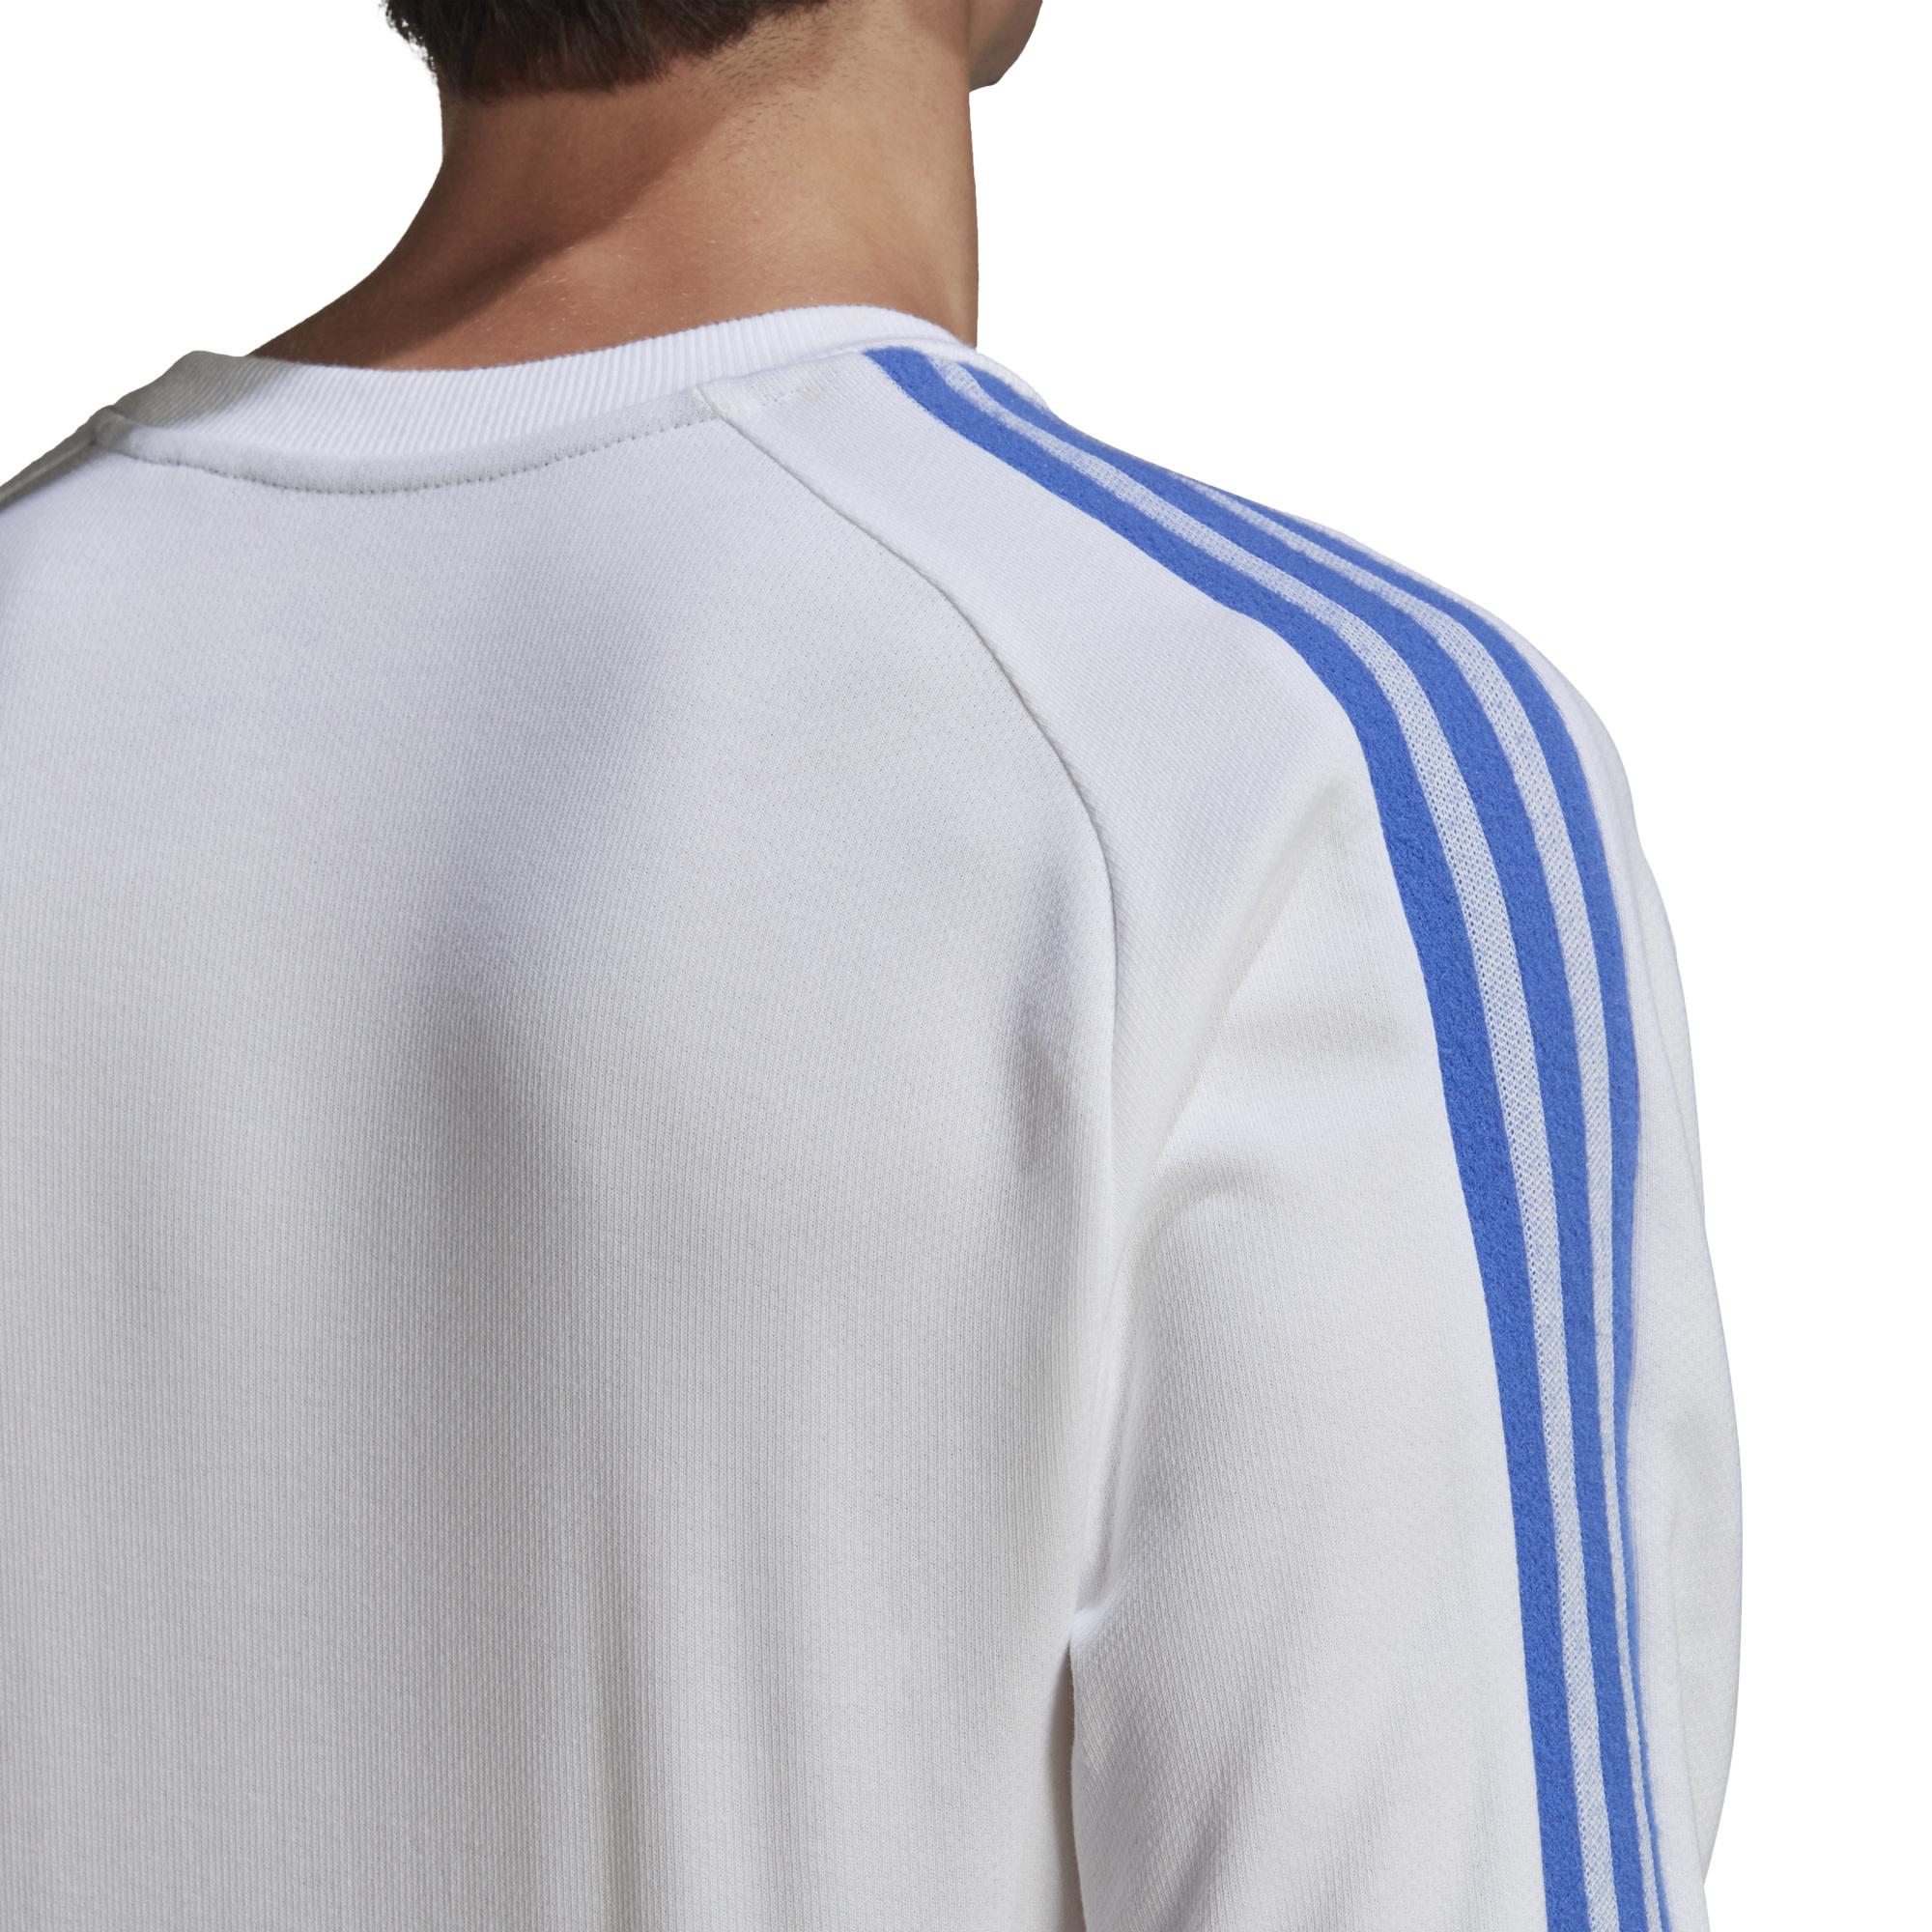 Adidas ADIDAS Real Madrid Icons Shirt